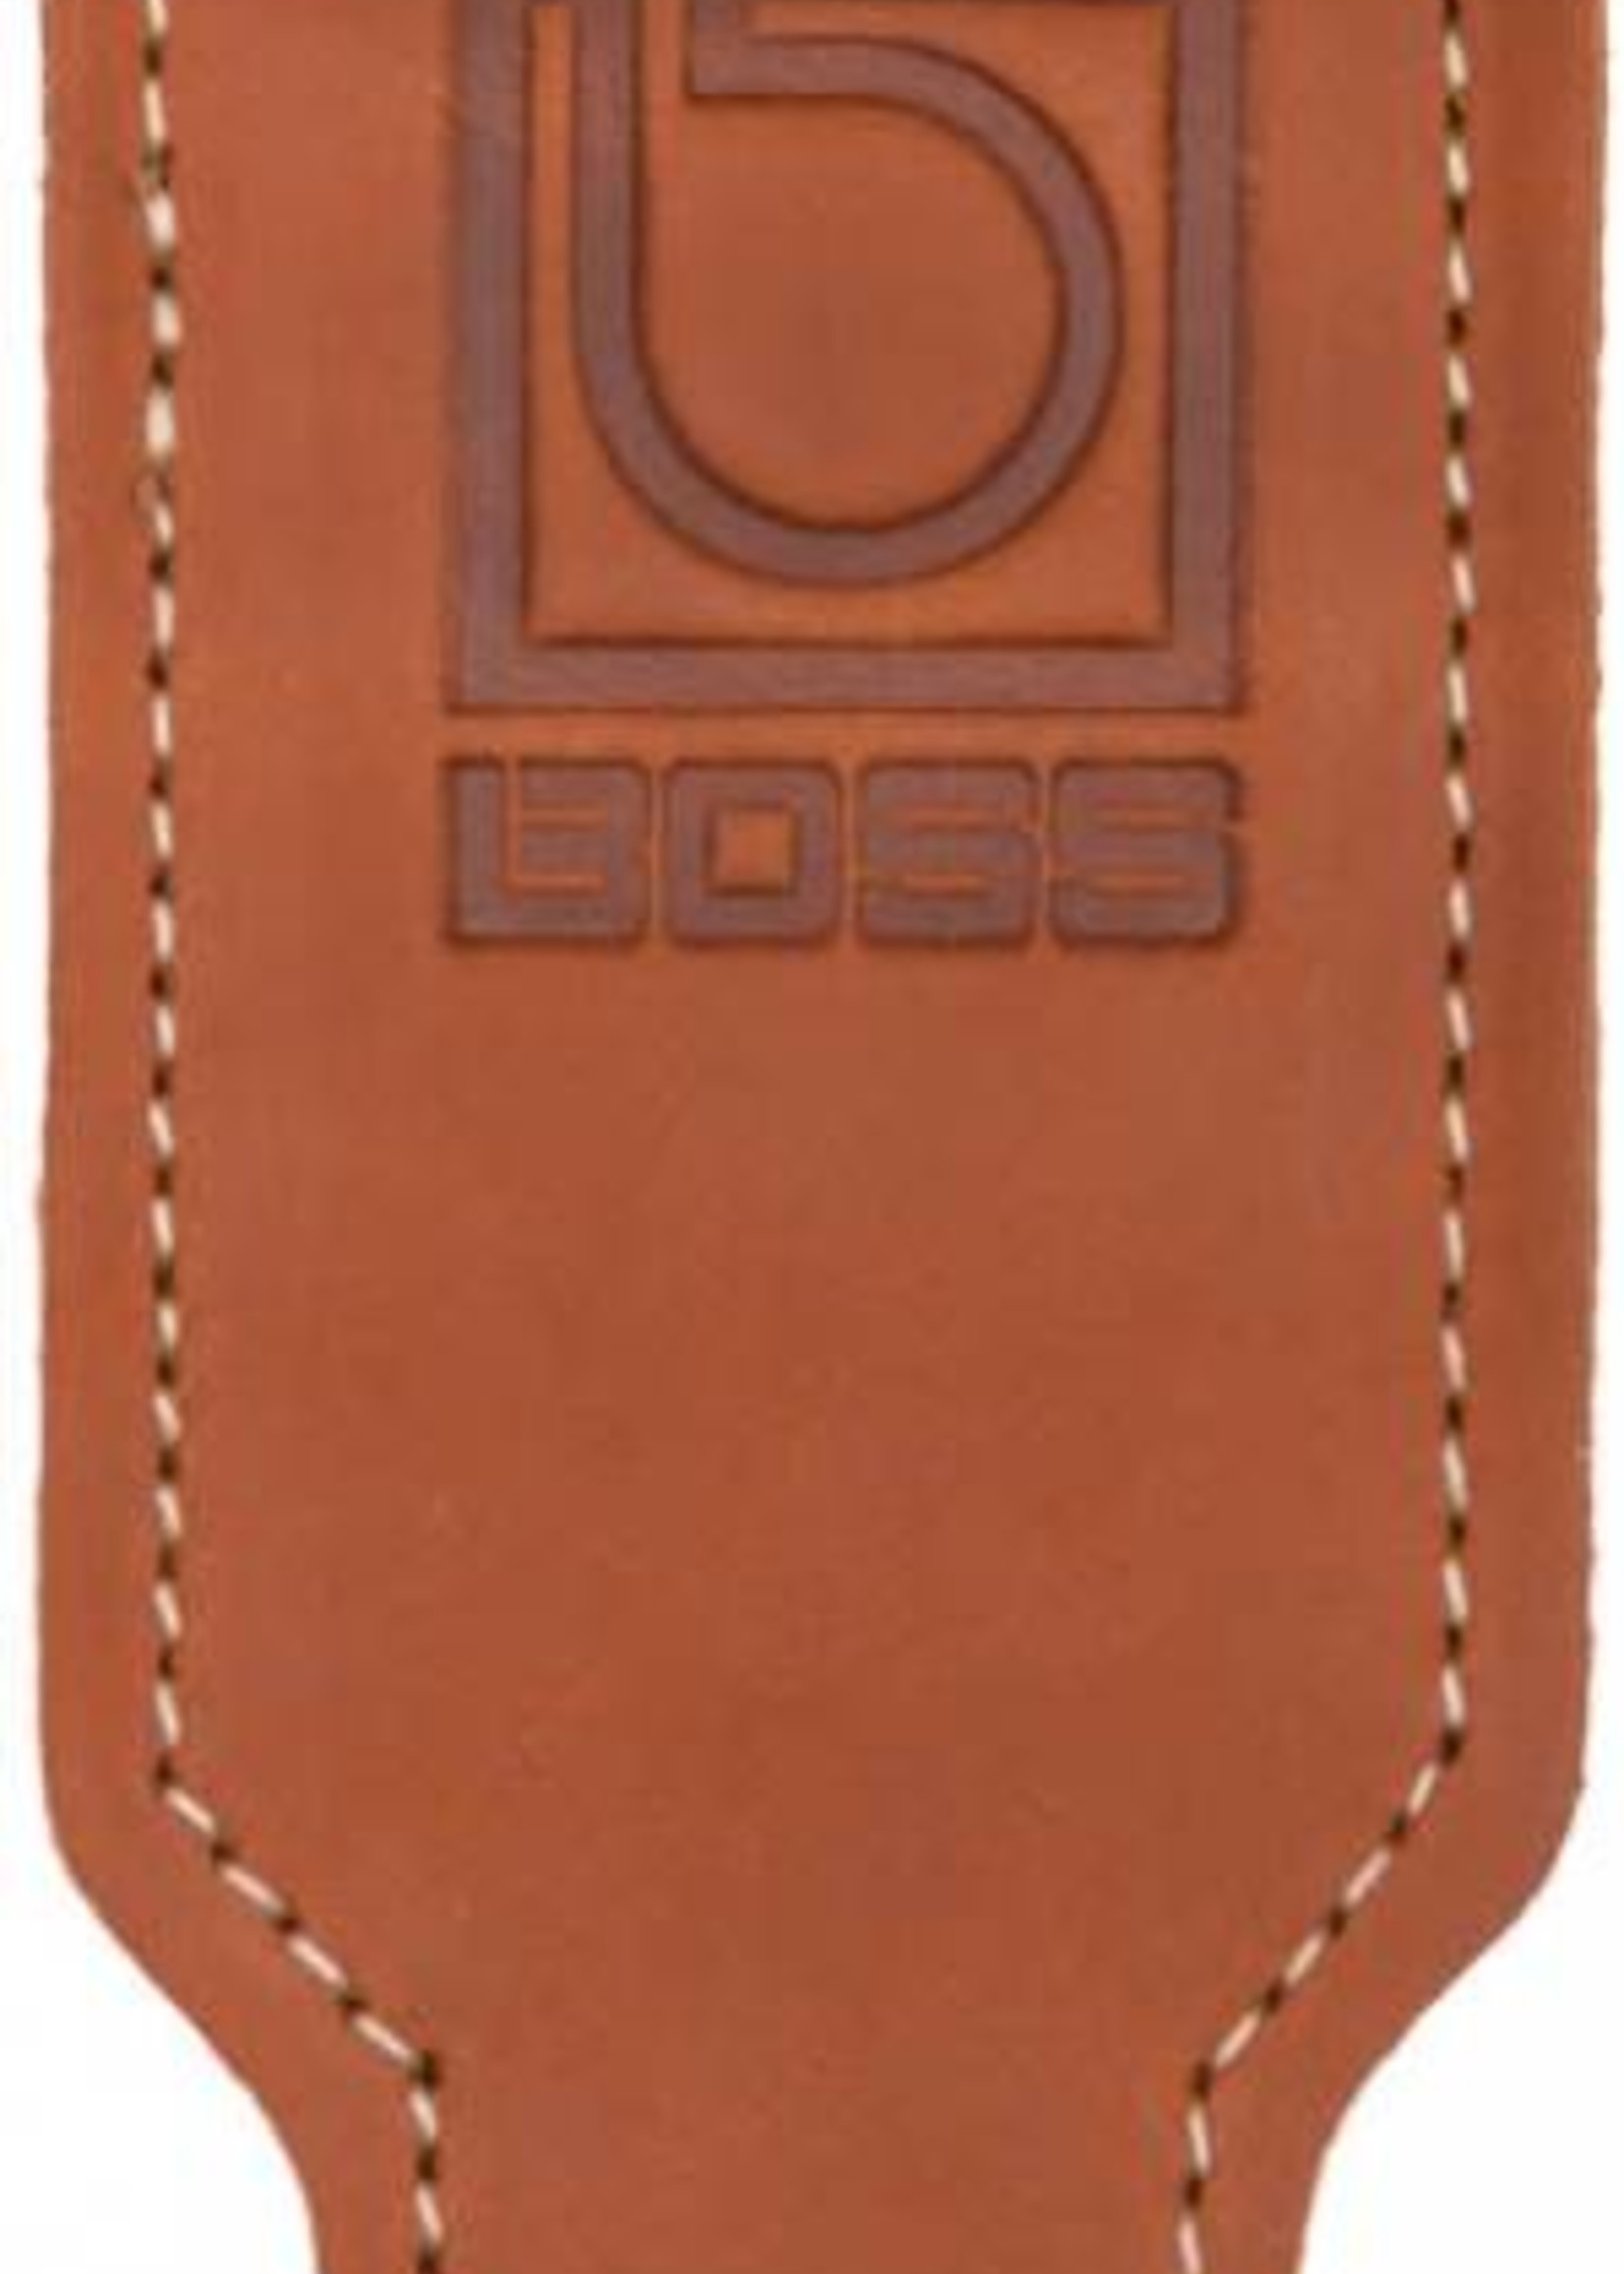 BOSS BSC-20-BRN BOSS